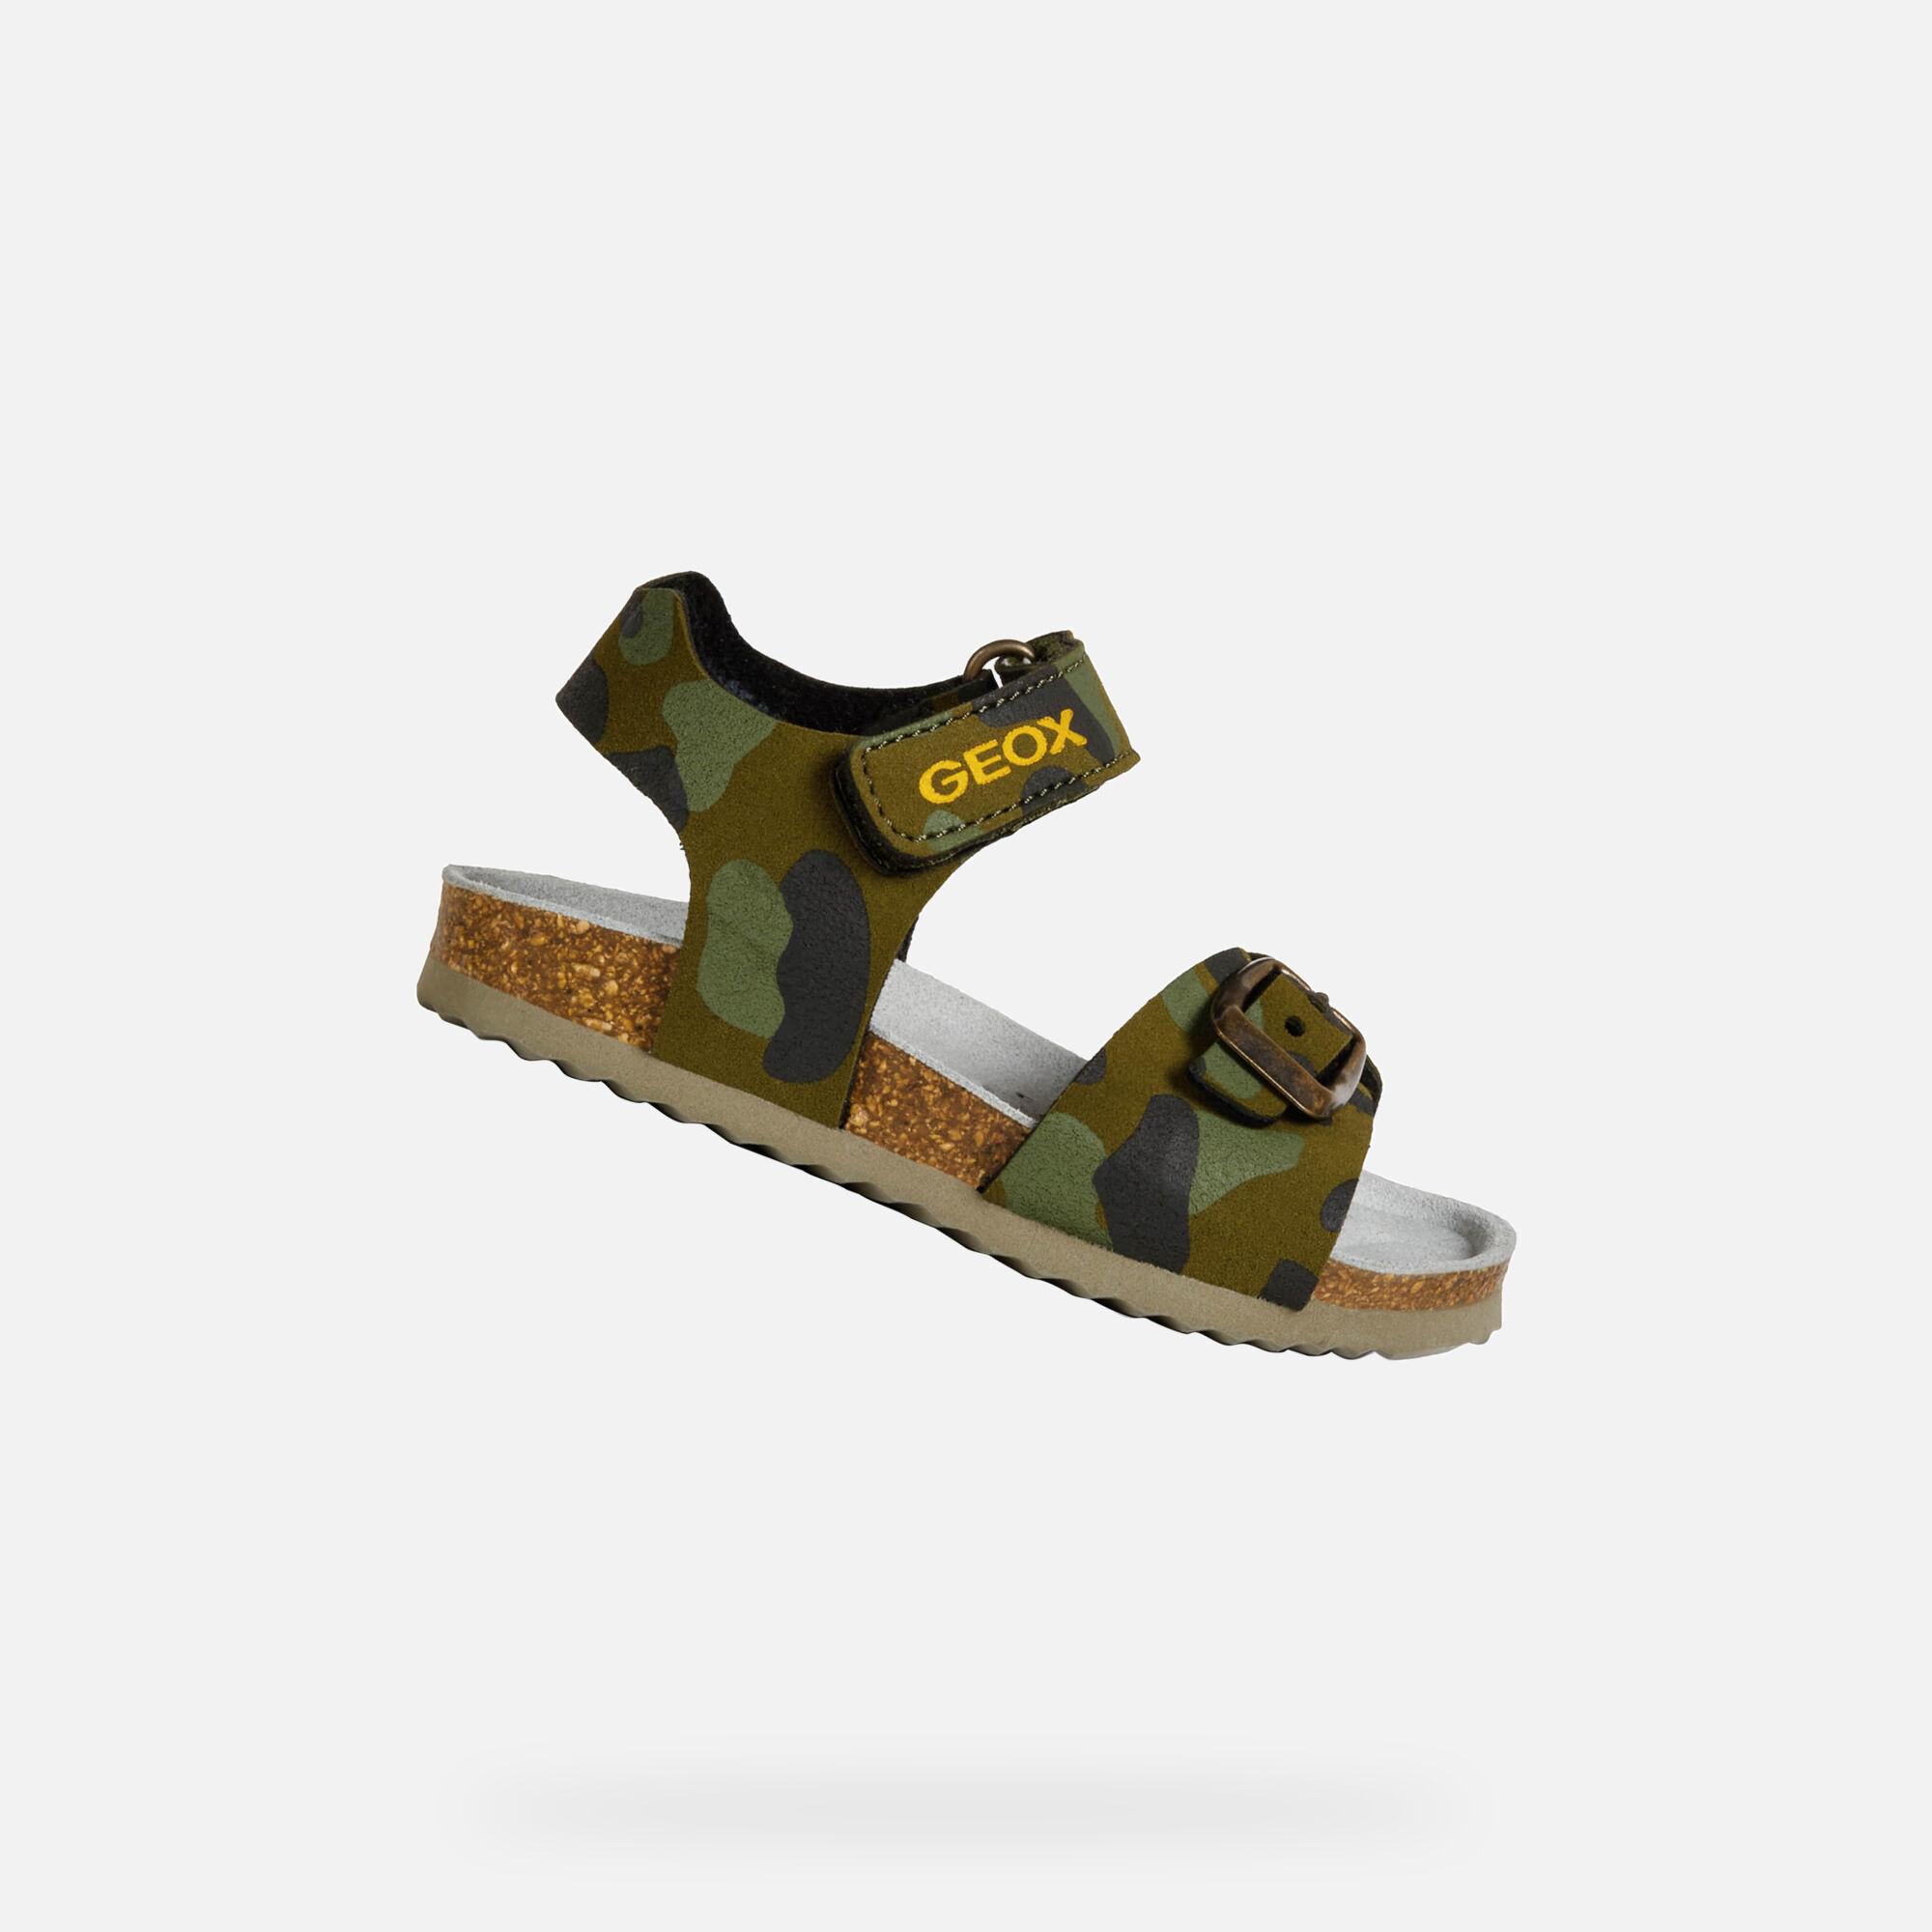 Geox CHALKI BABY Boy: Military Sandals